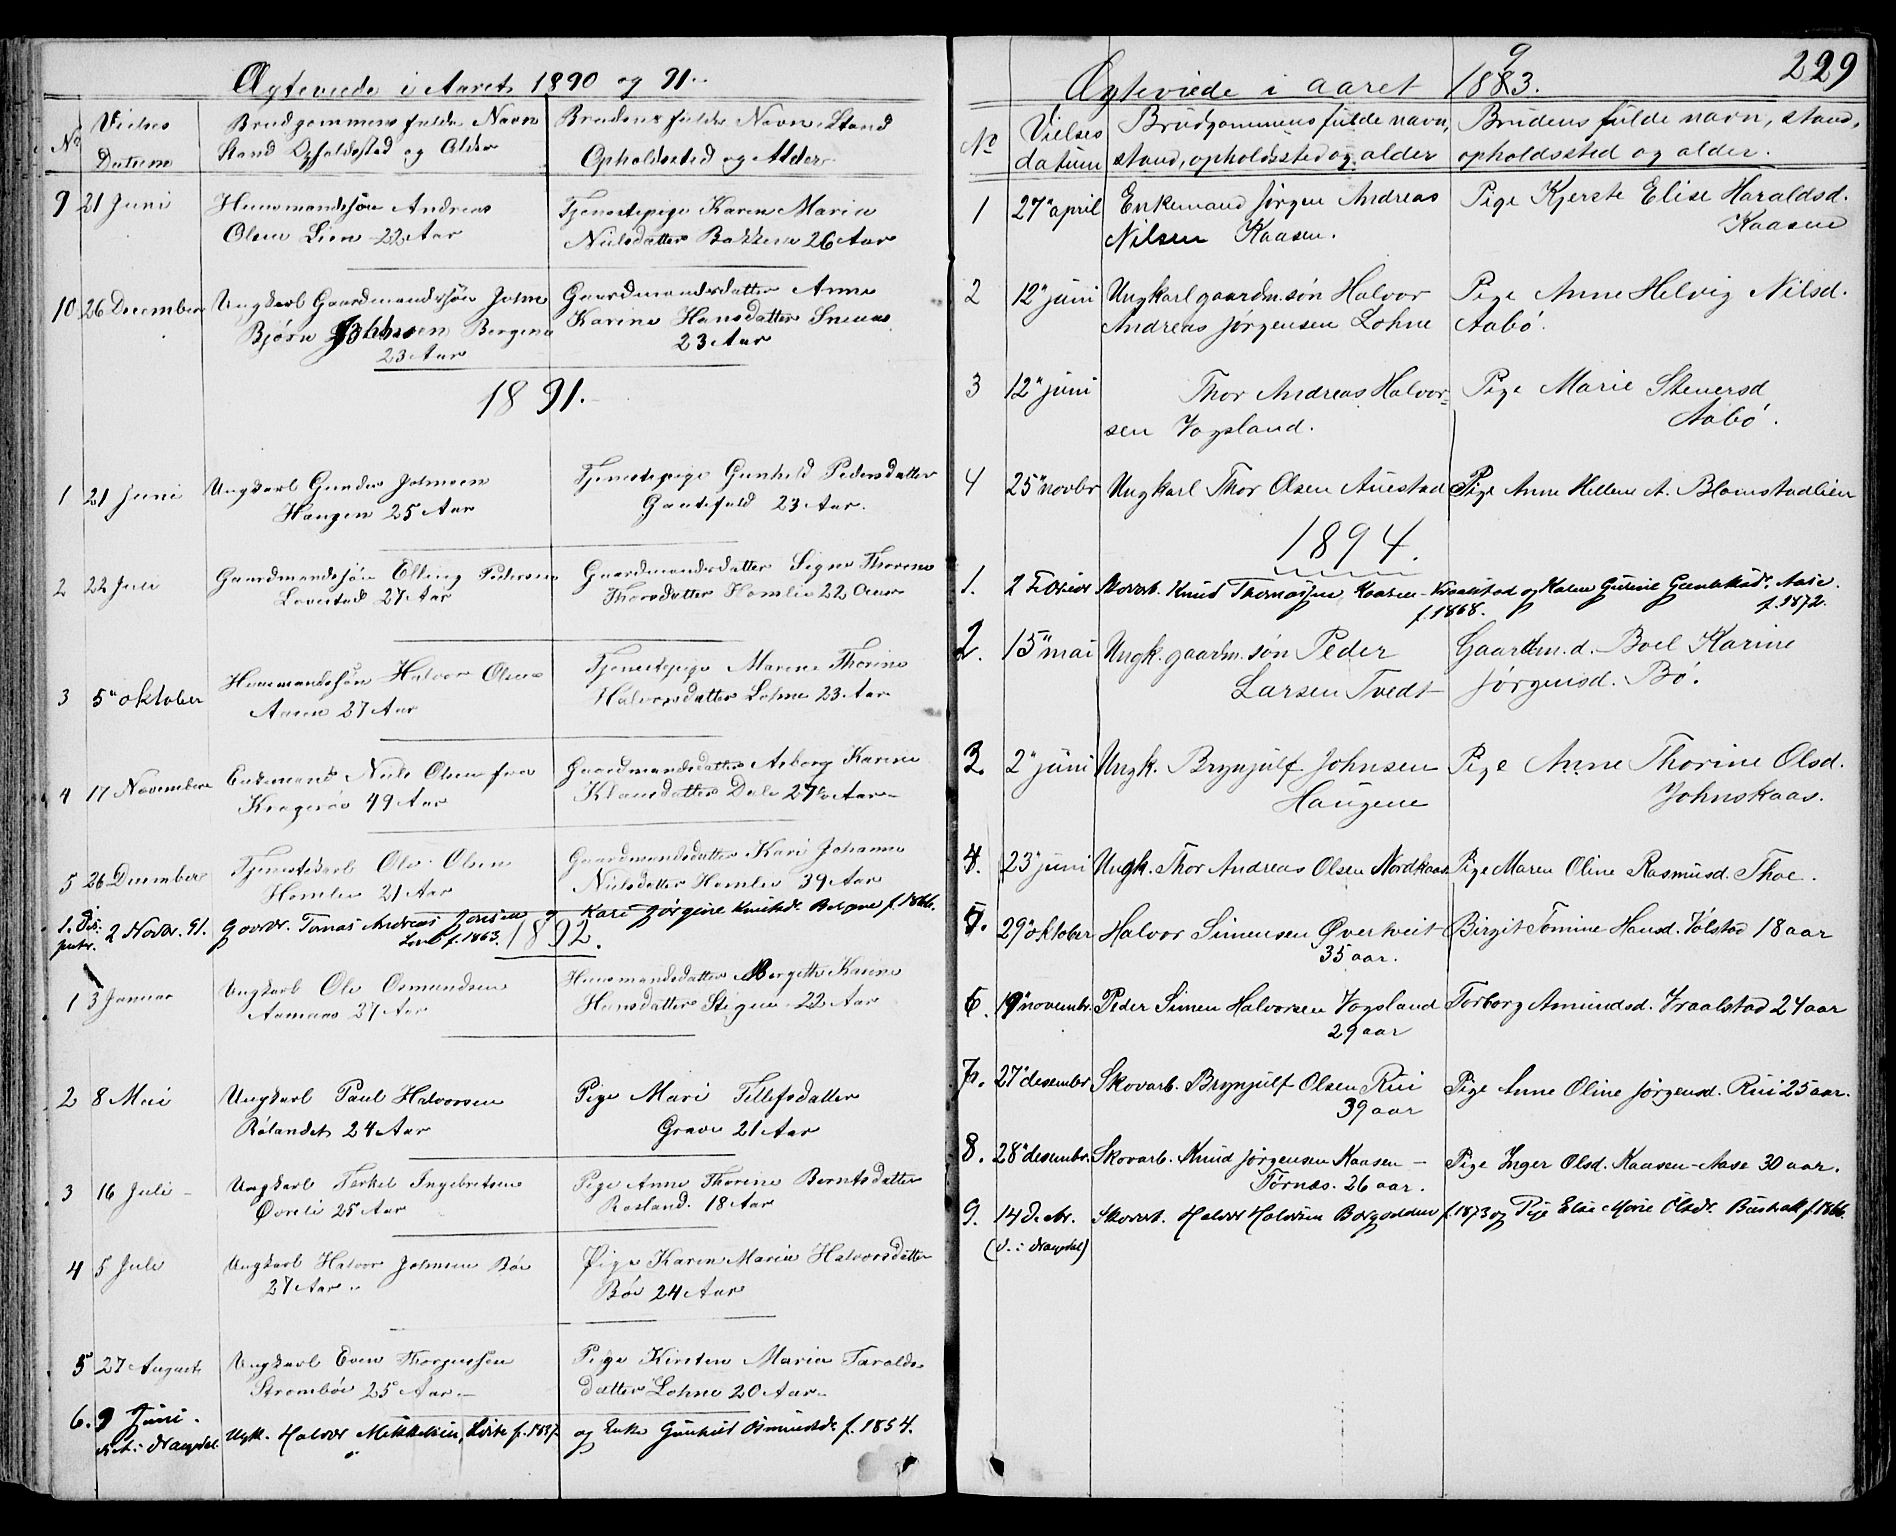 SAKO, Drangedal kirkebøker, G/Gb/L0001: Klokkerbok nr. II 1, 1856-1894, s. 229